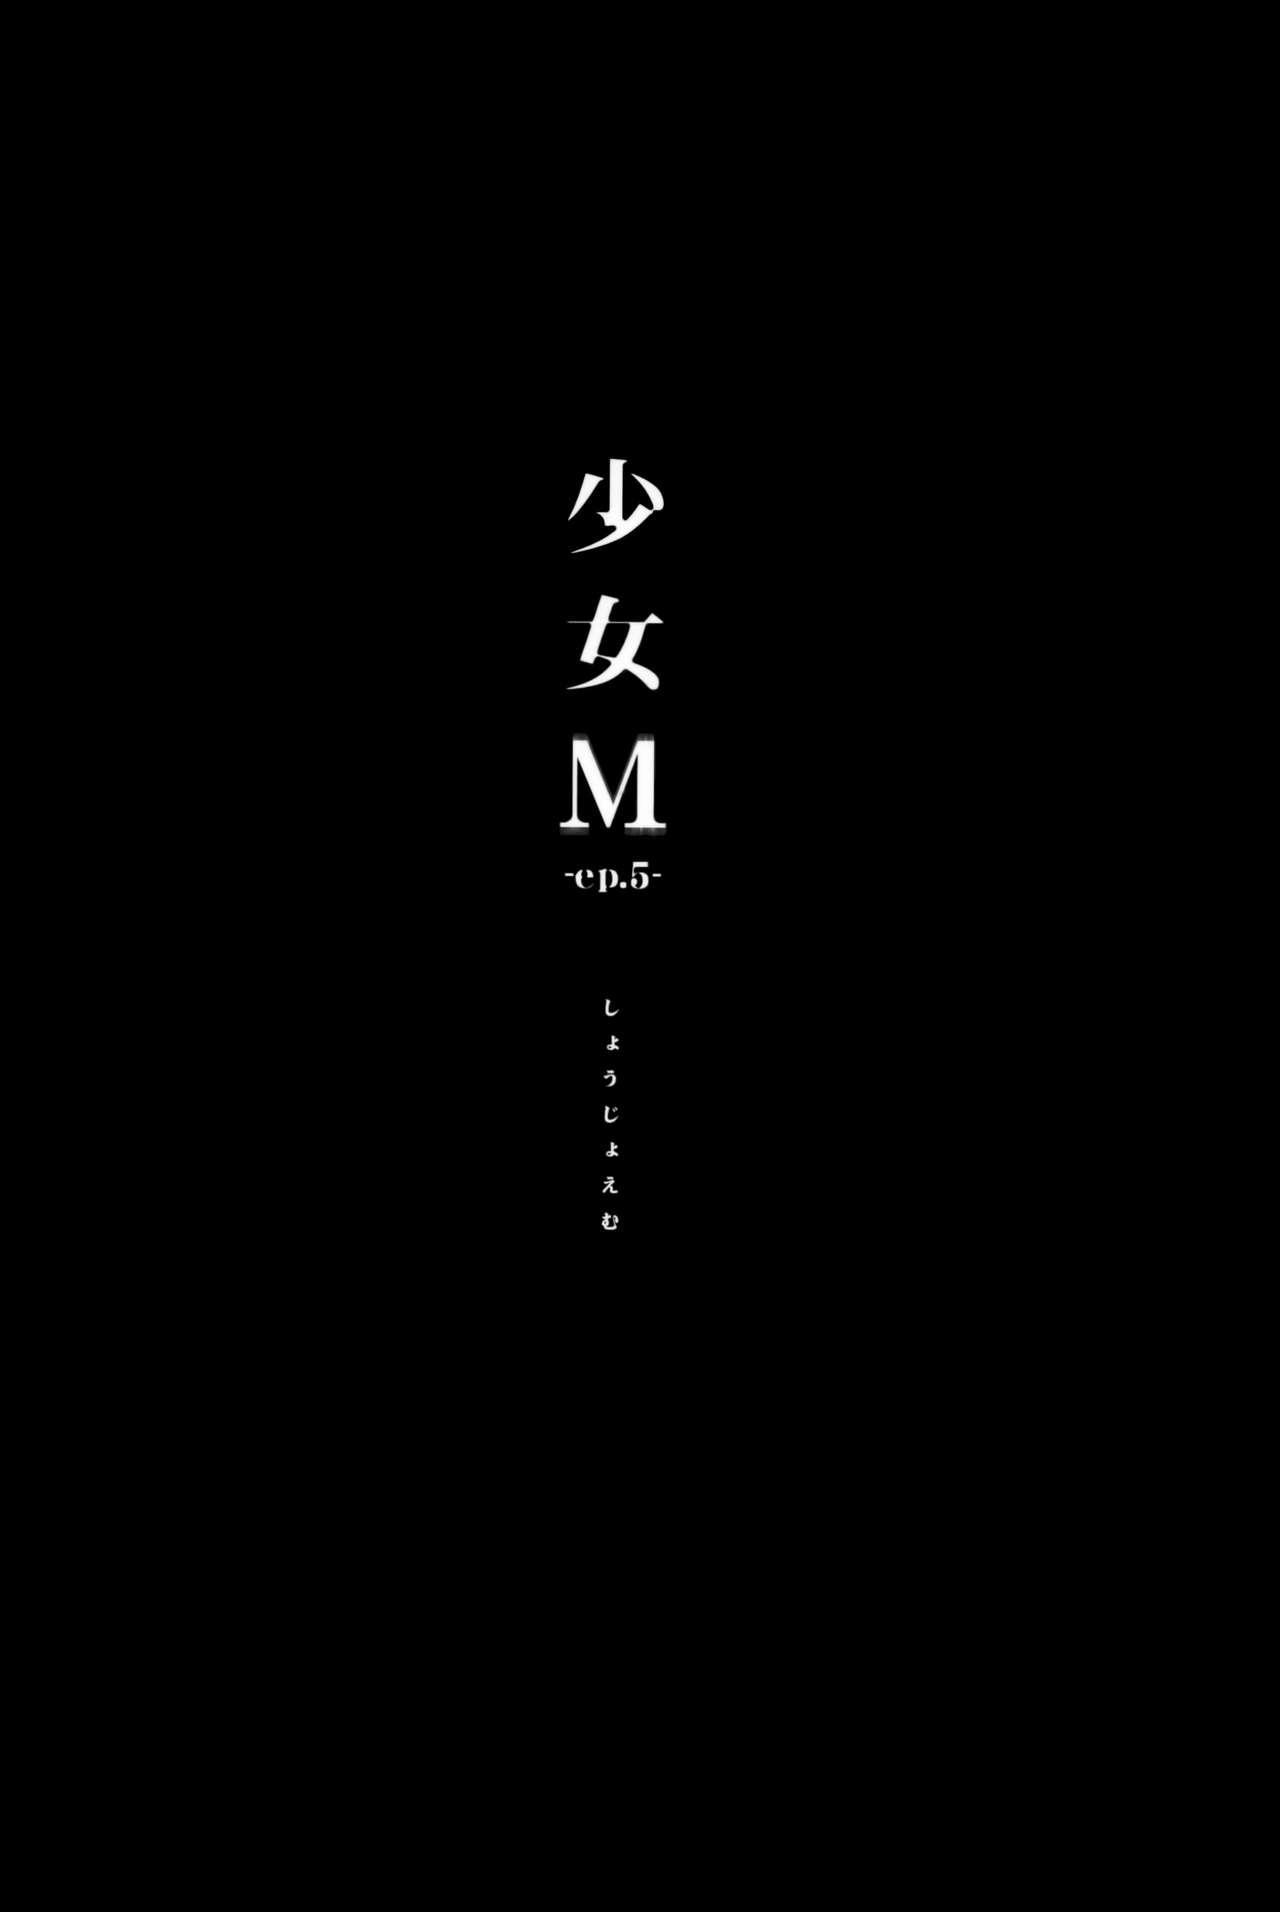 Shoujo M 84